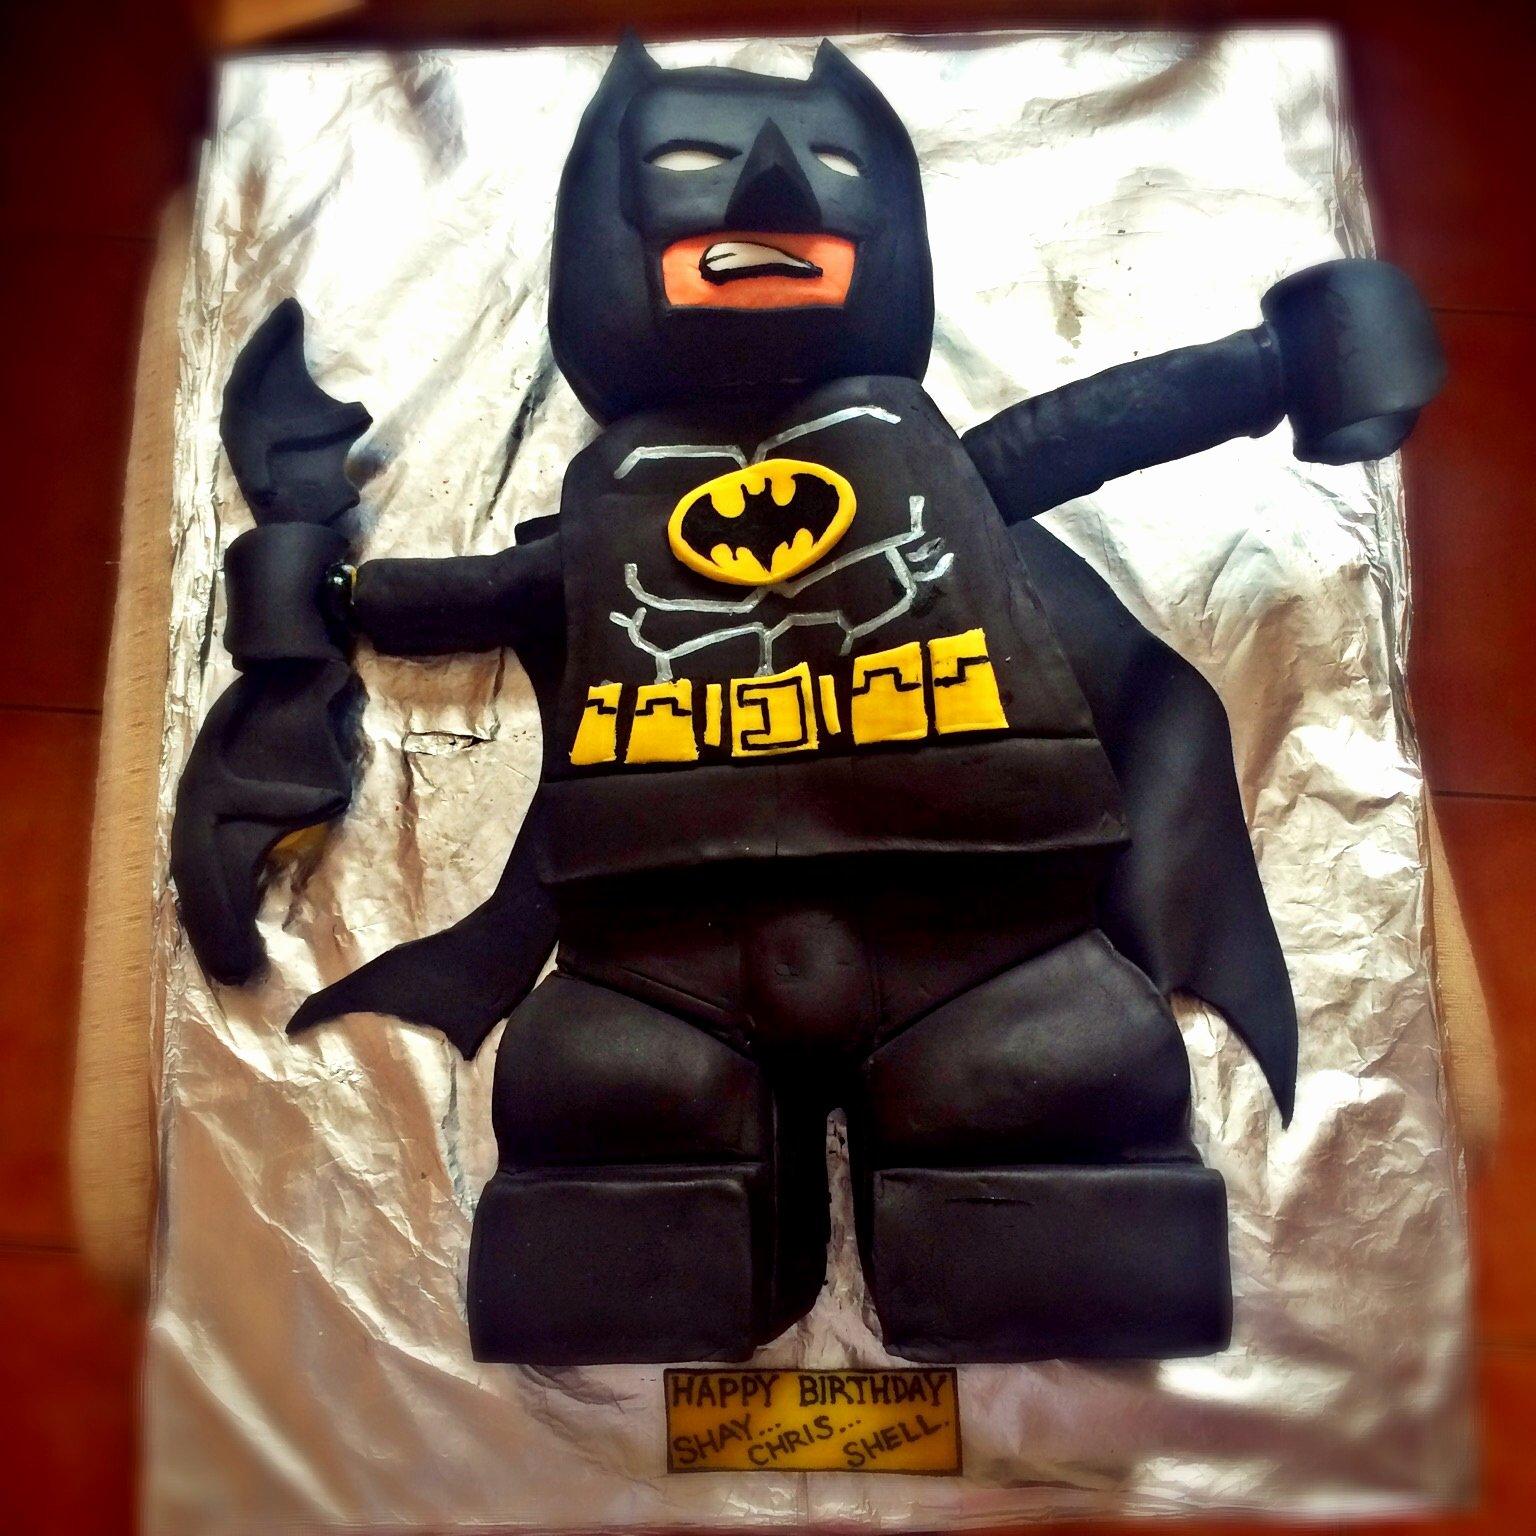 Batman Cake Template Unique Howtocookthat Cakes Dessert & Chocolate